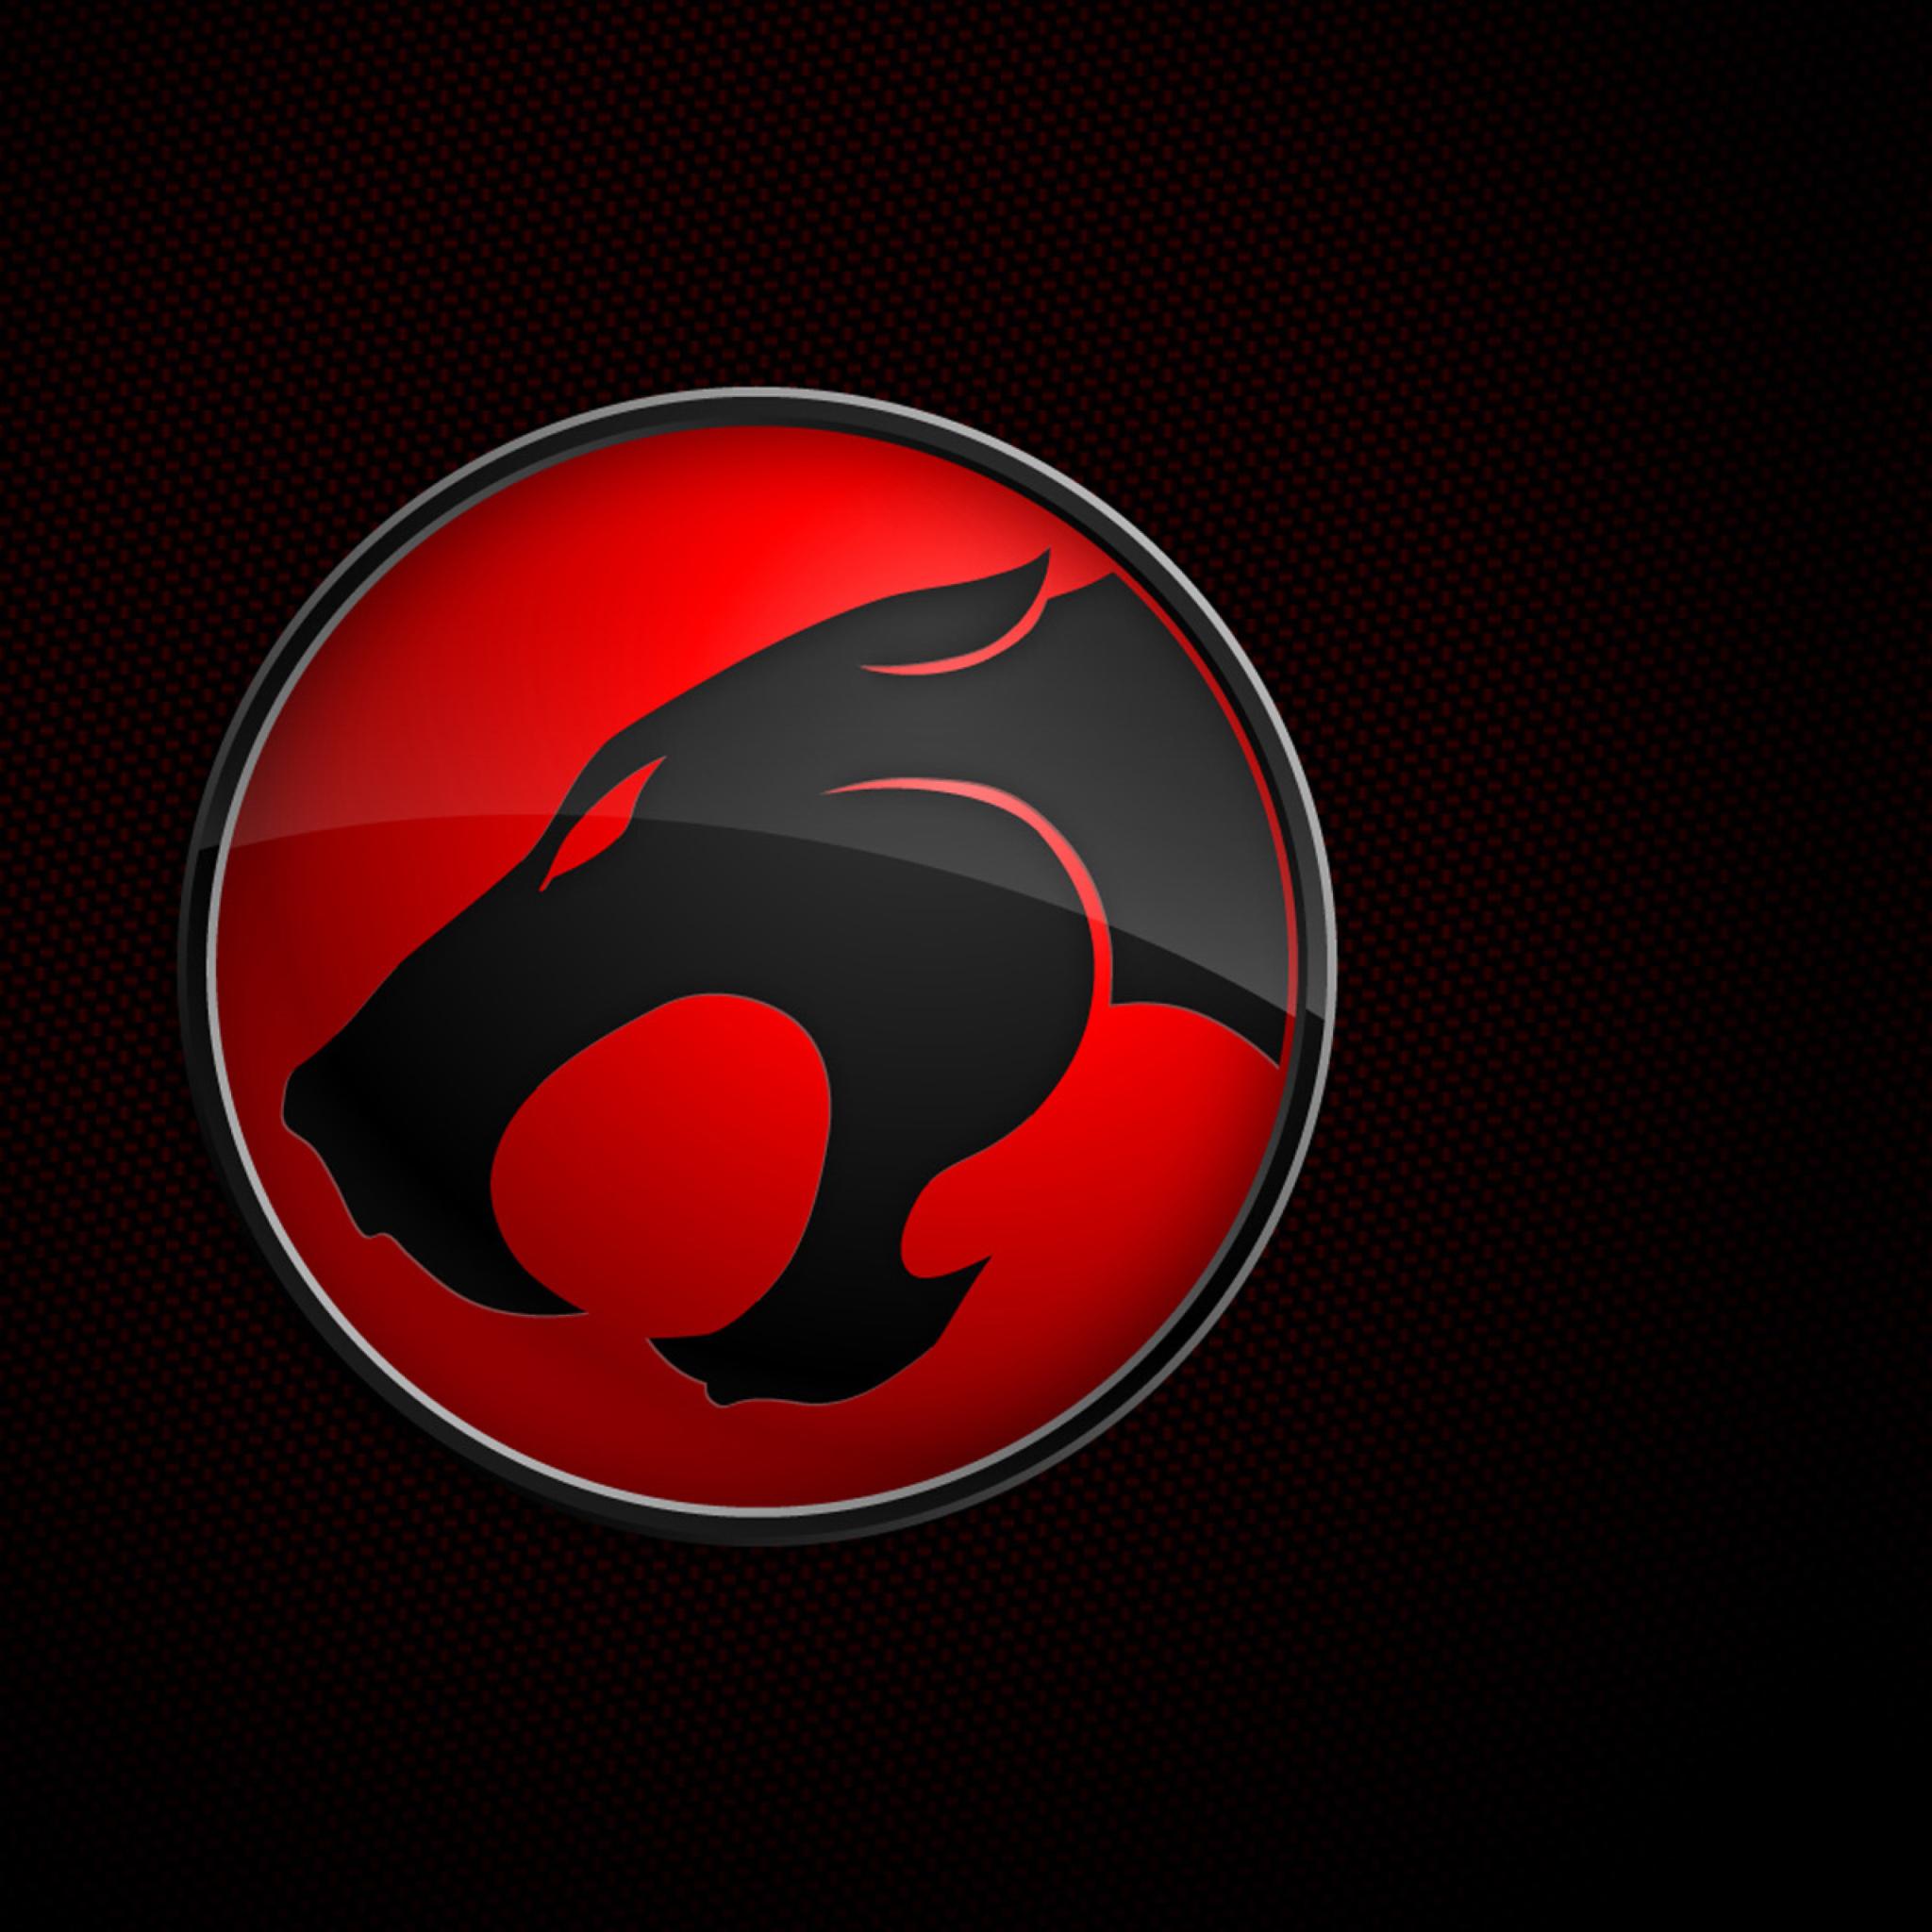 Thundercats Logo Wallpaper 61 Images: Thundercats HD Wallpaper For 2048x2048